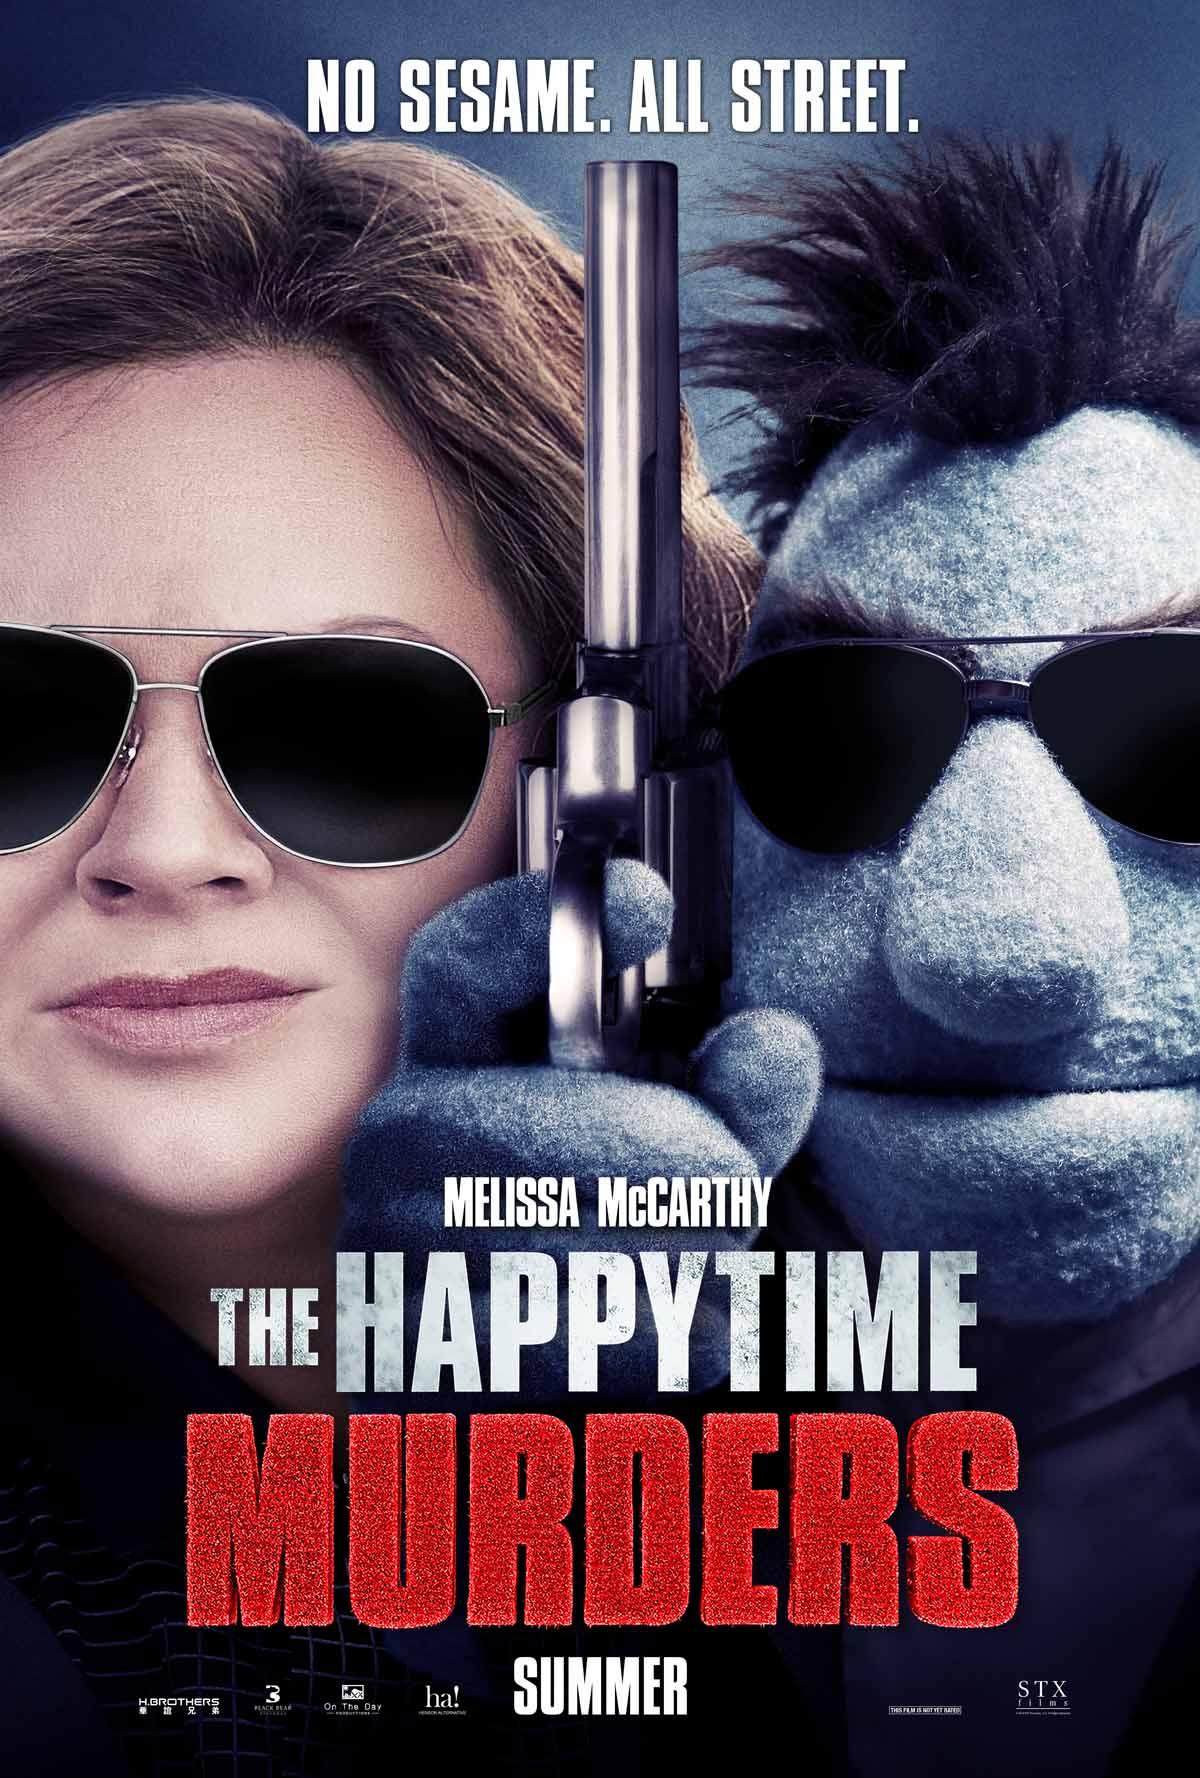 the-happytime-murders-349543id2_happytimemurders_27x40_1-sht_rgb